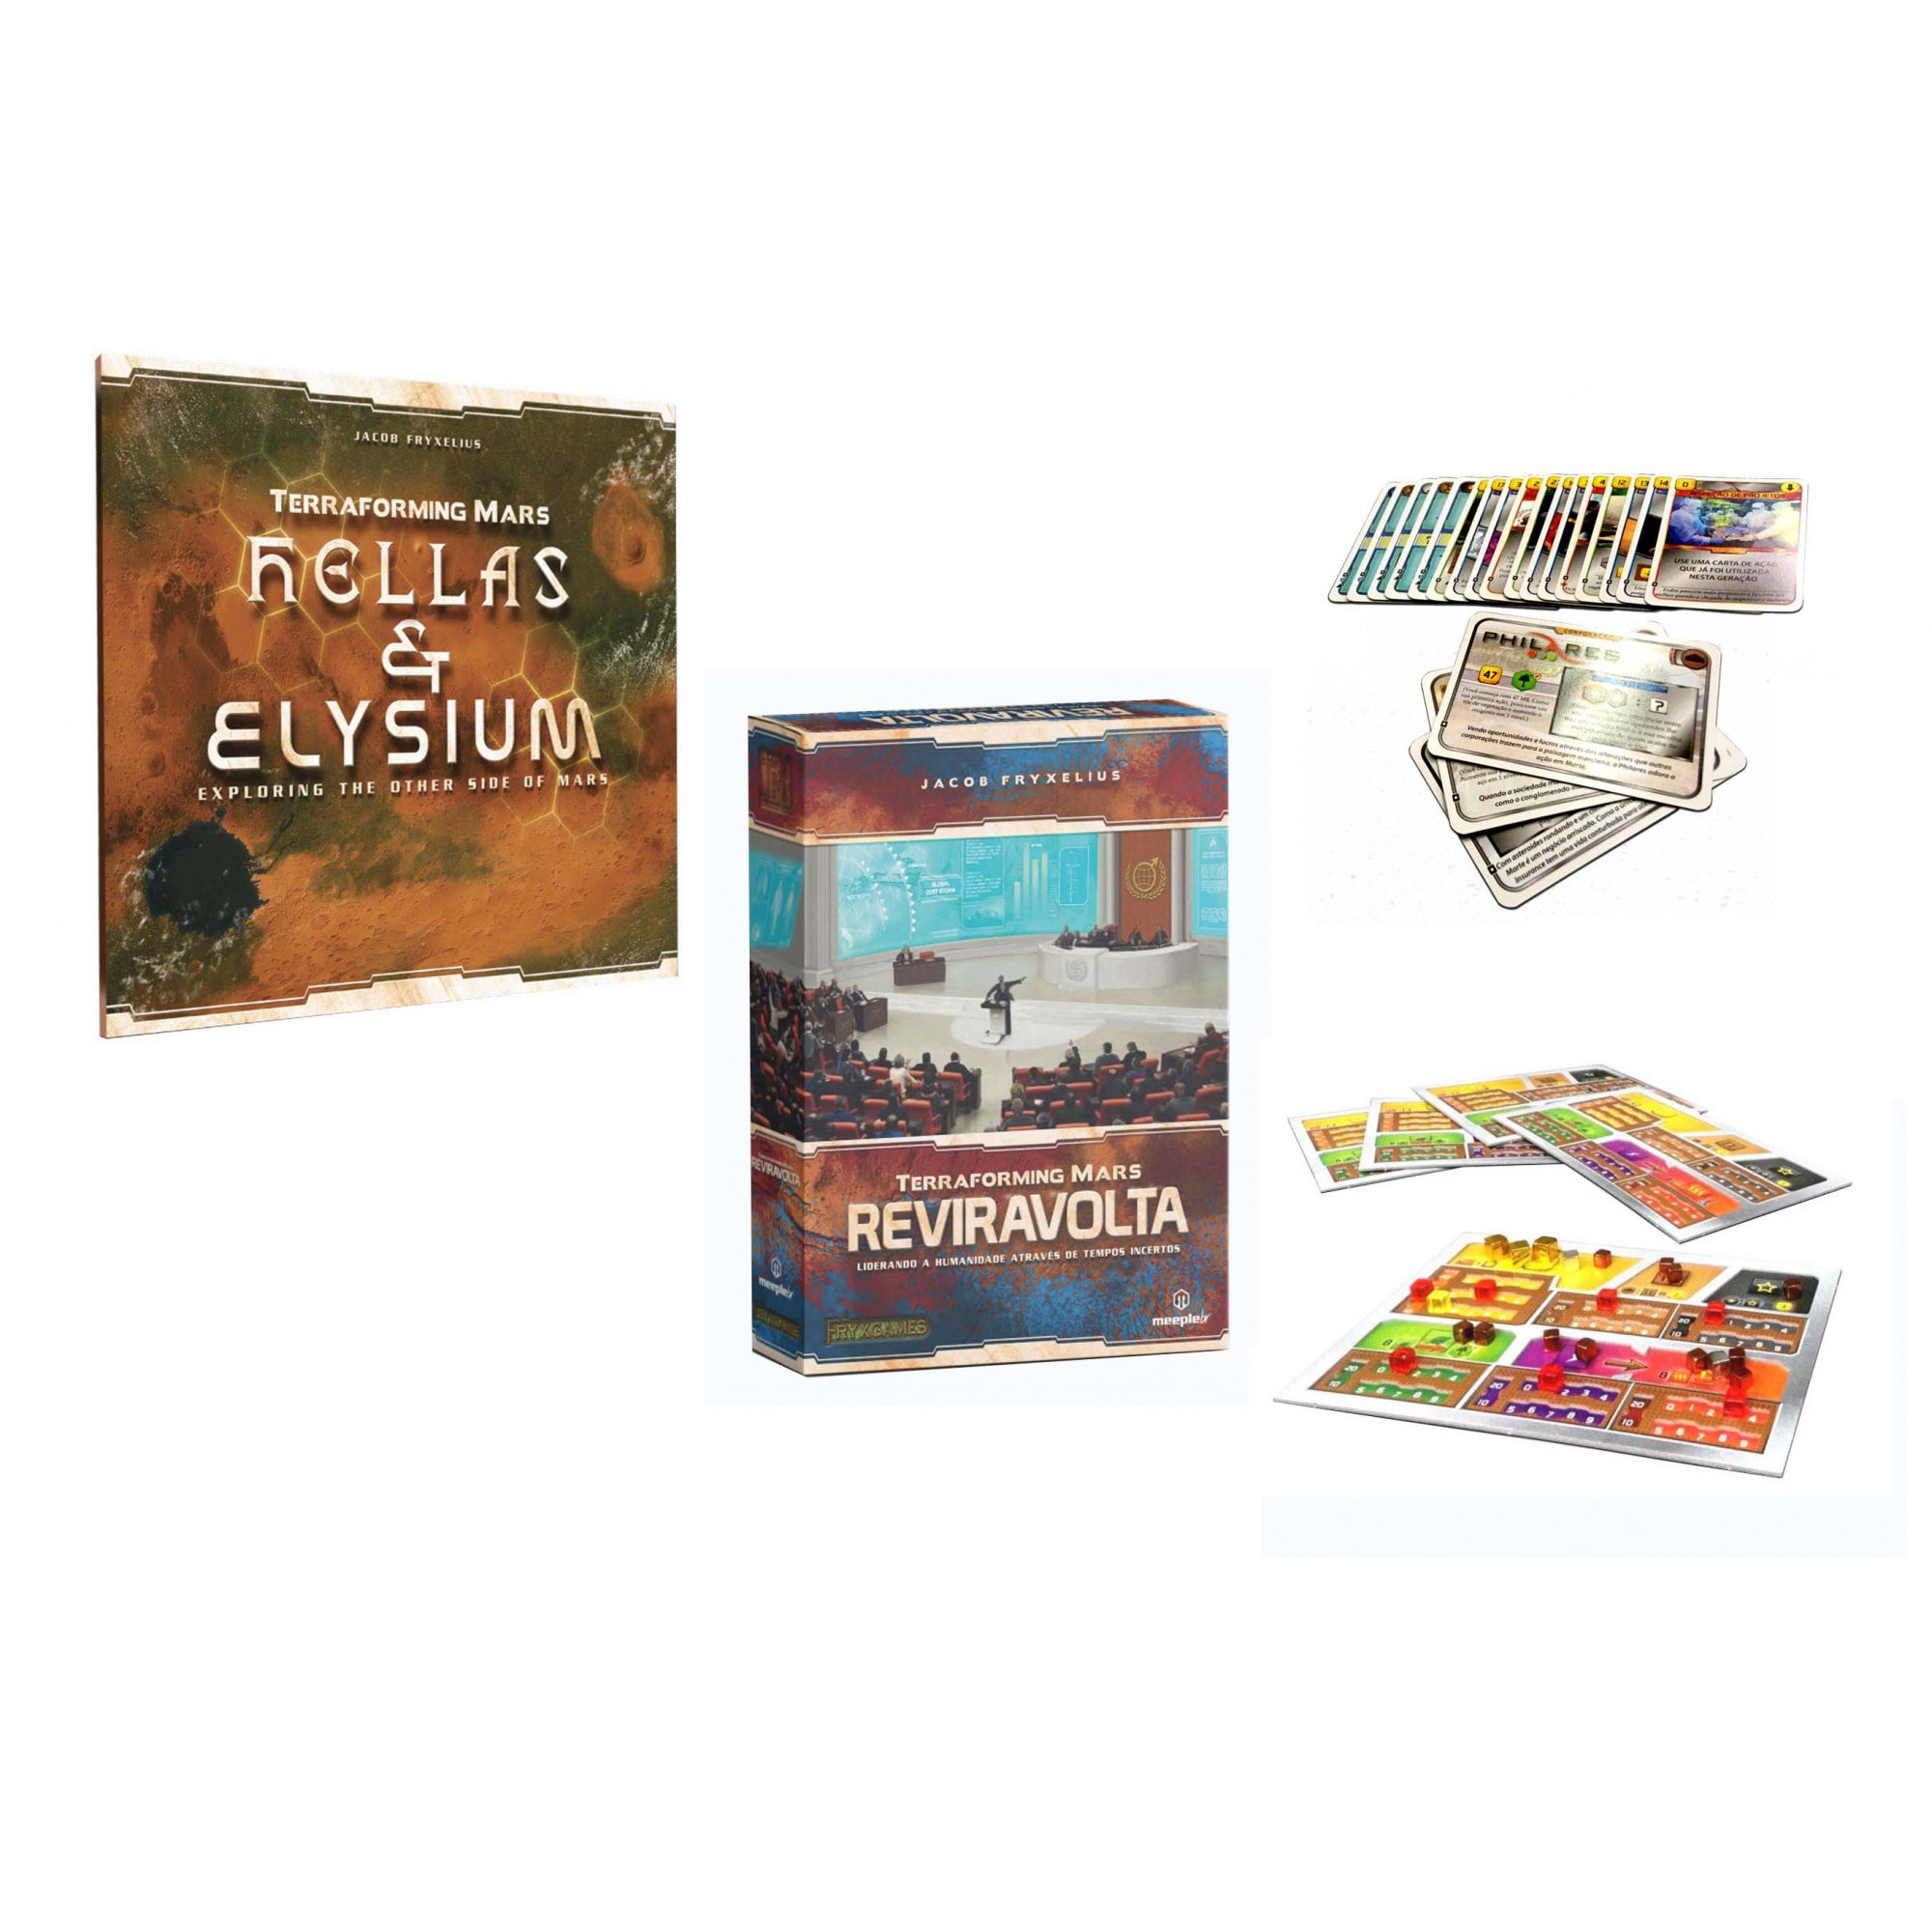 Terraforming Mars Hellas & Elysium + Promos Kick Starter + Reviravolta Expansões de Jogo de Tabuleiro Meeple BR  - Place Games